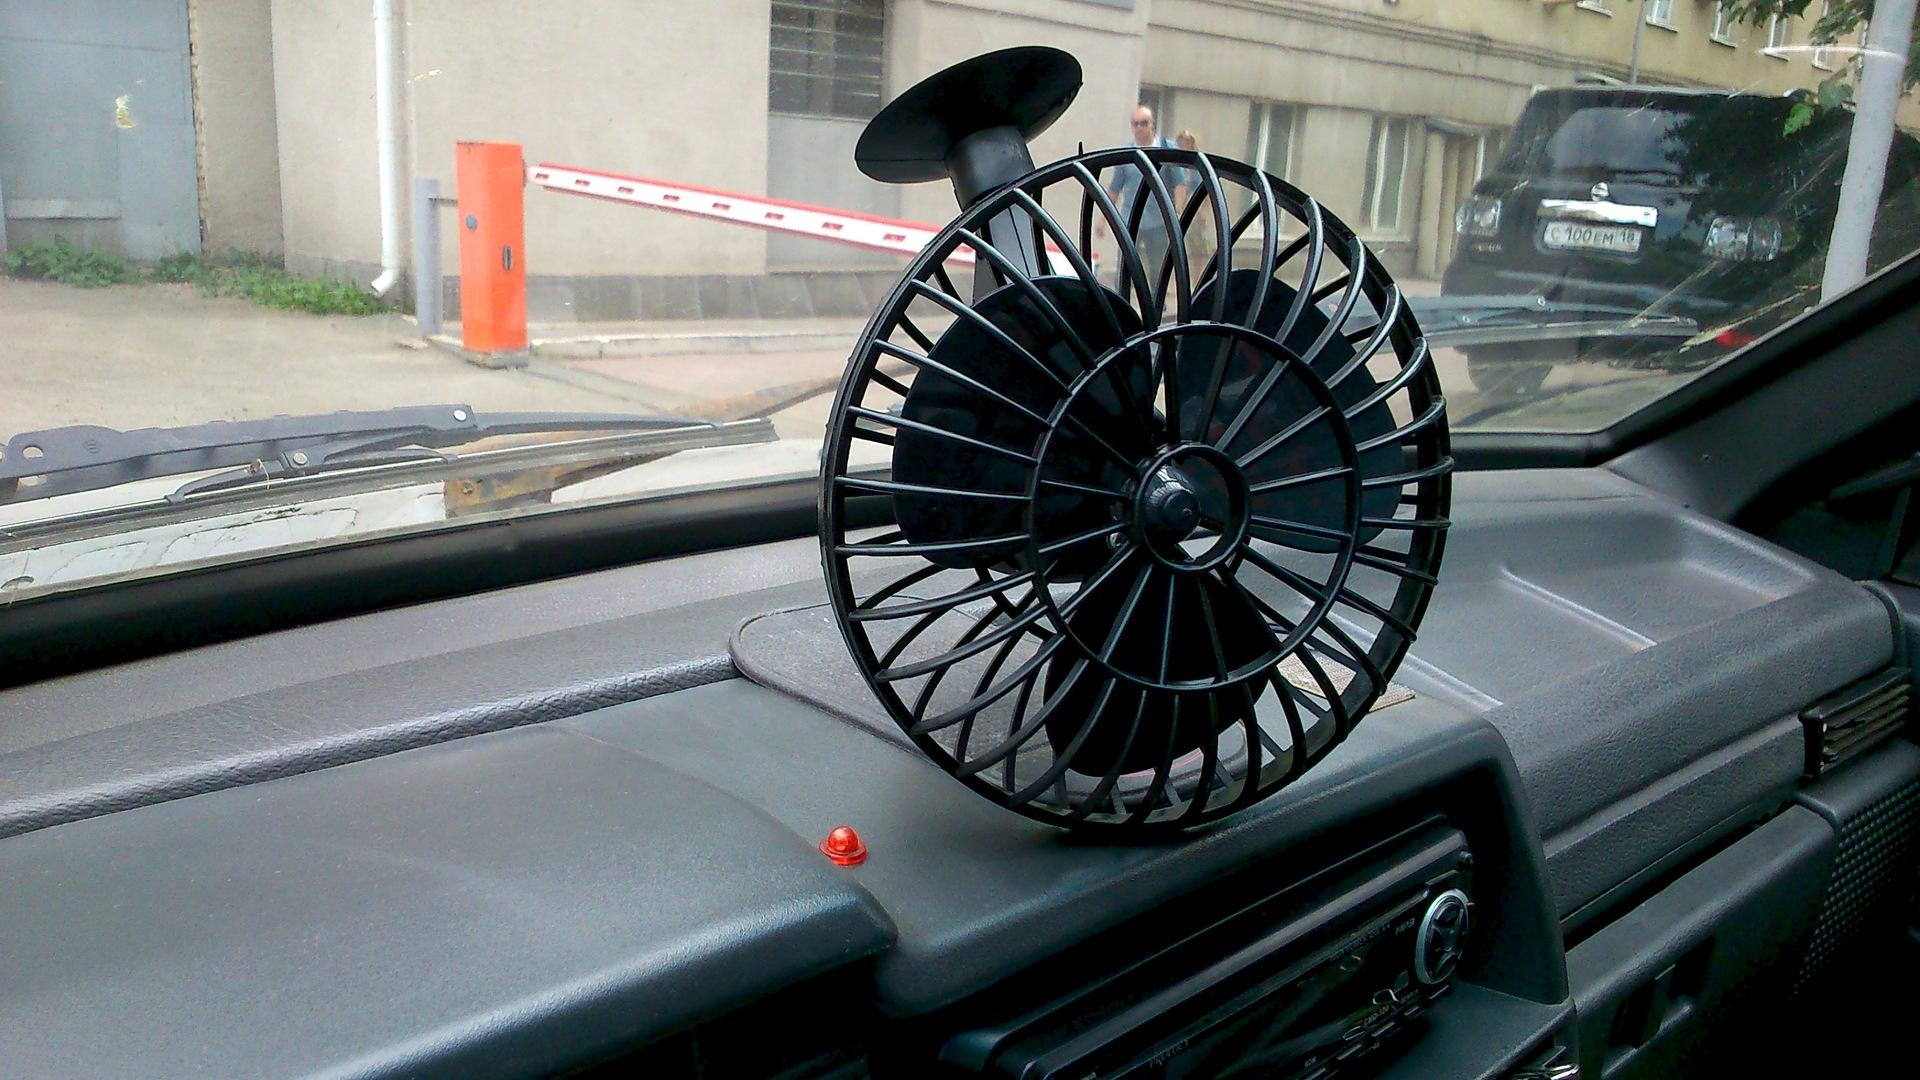 Вентилятор для автомобиля своими руками